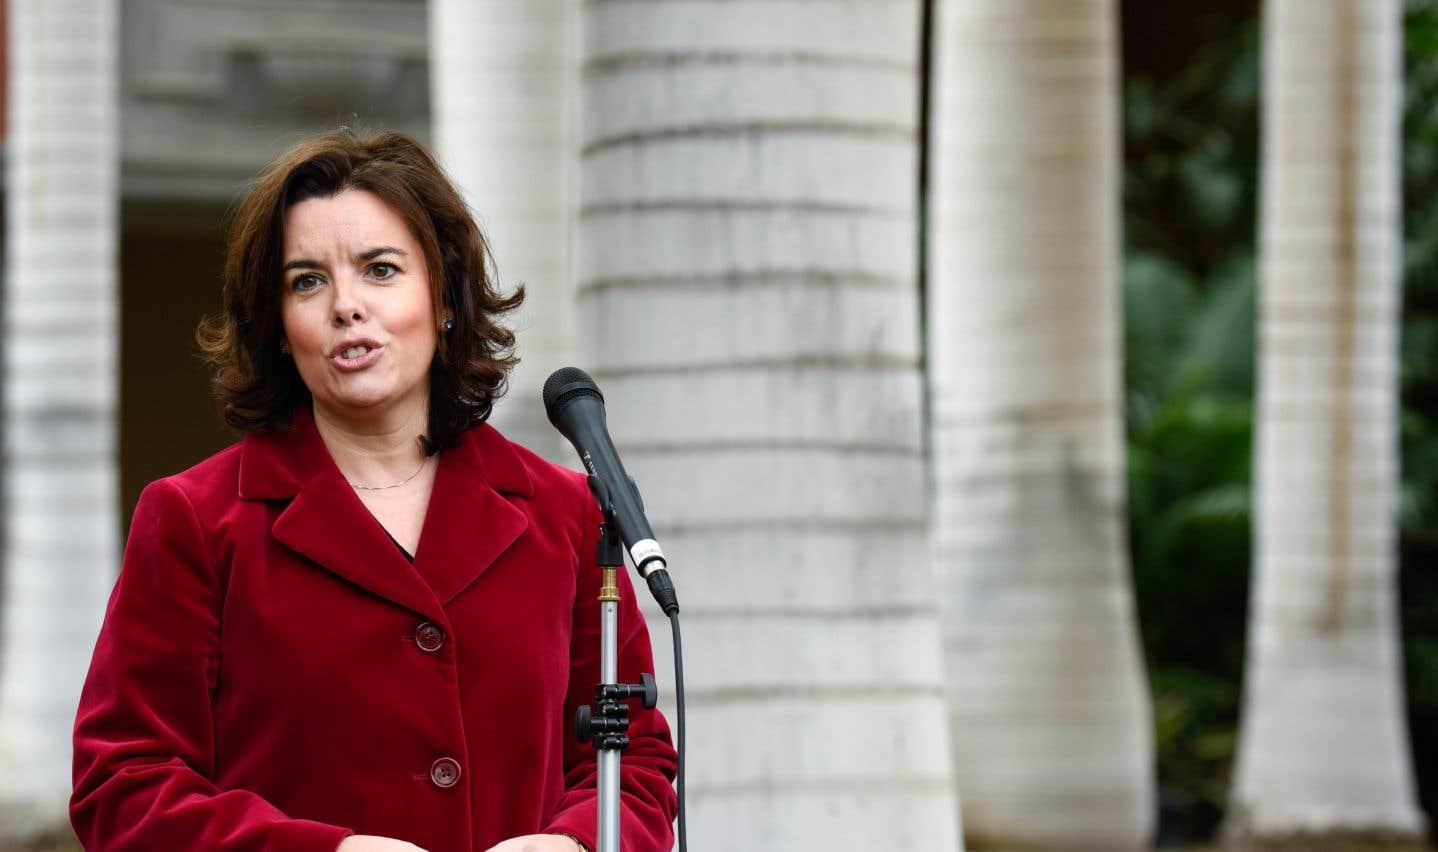 La vice-première ministre espagnole, Soraya Sáenz de Santamaría